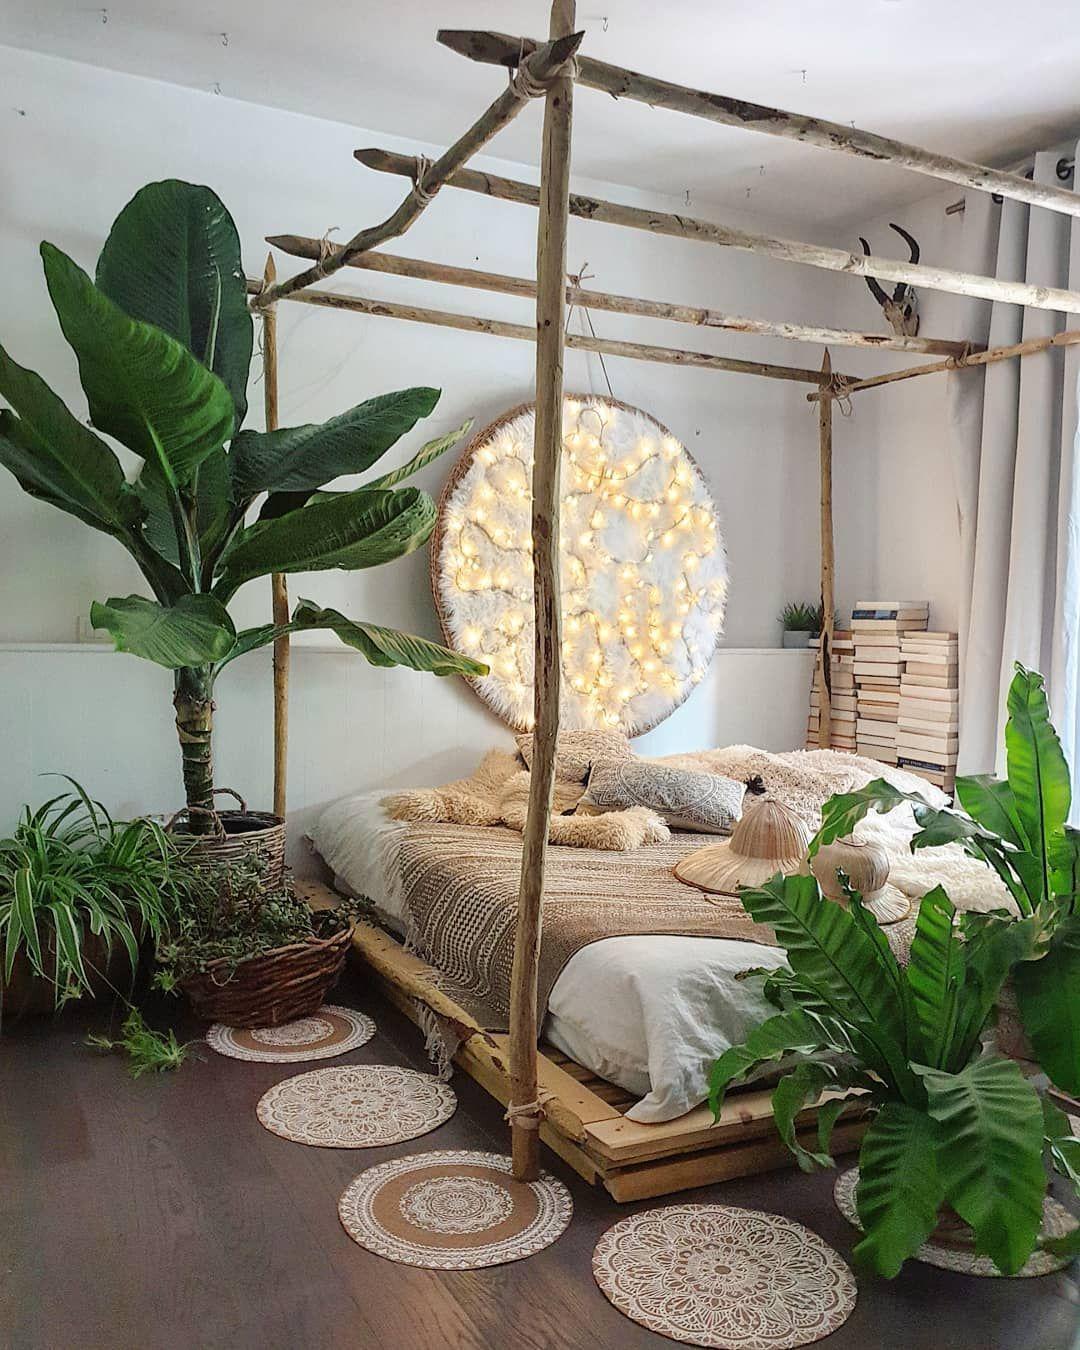 Polubienia 9 897 Komentarze 185 Zebodeko Na Instagramie It Was A Fruitfull Week I In 2020 Boho Bedroom Design Bohemian Bedroom Decor Aesthetic Bedroom